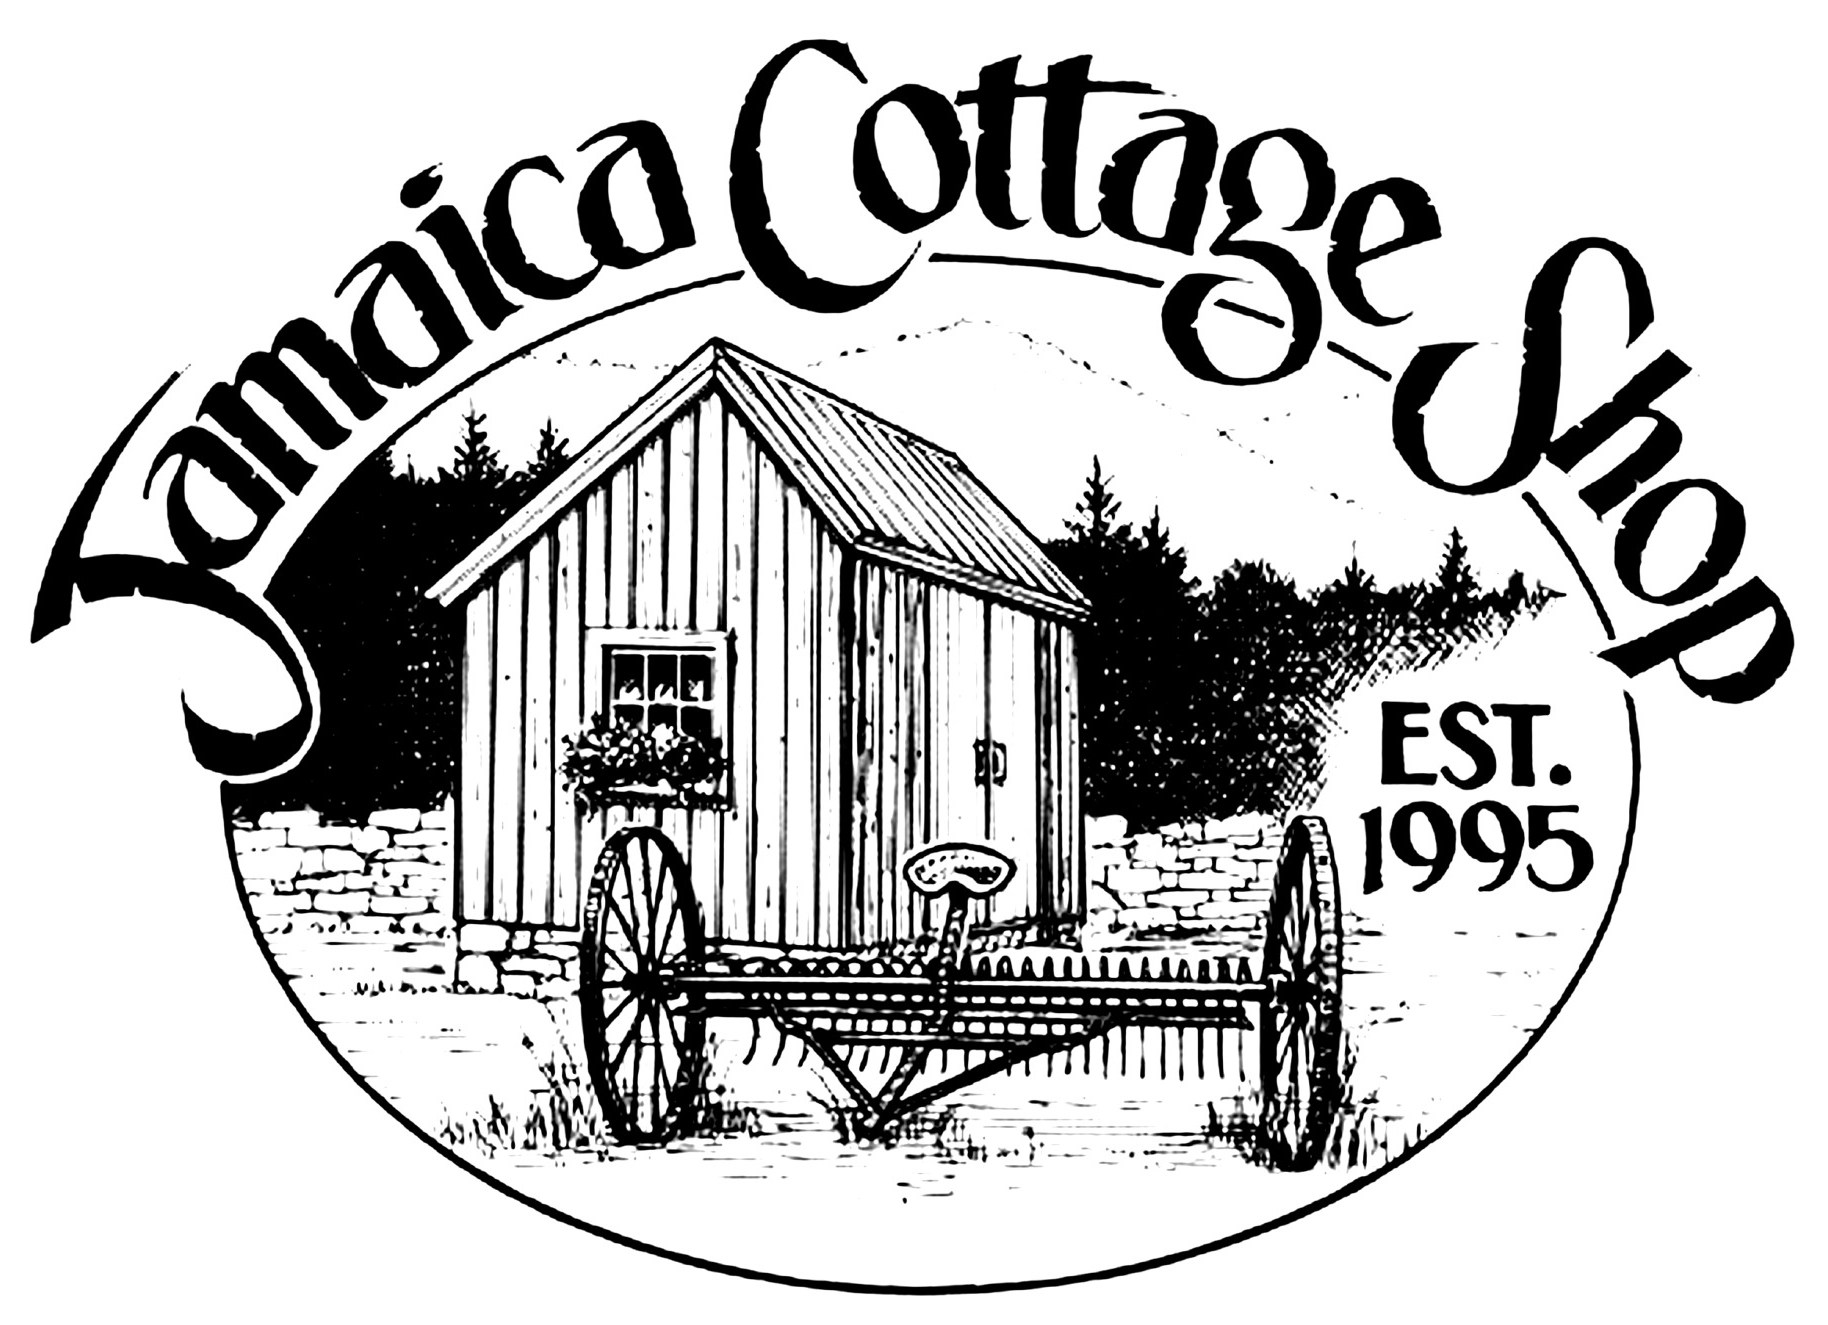 7500_Jamaica cottage shop.jpeg